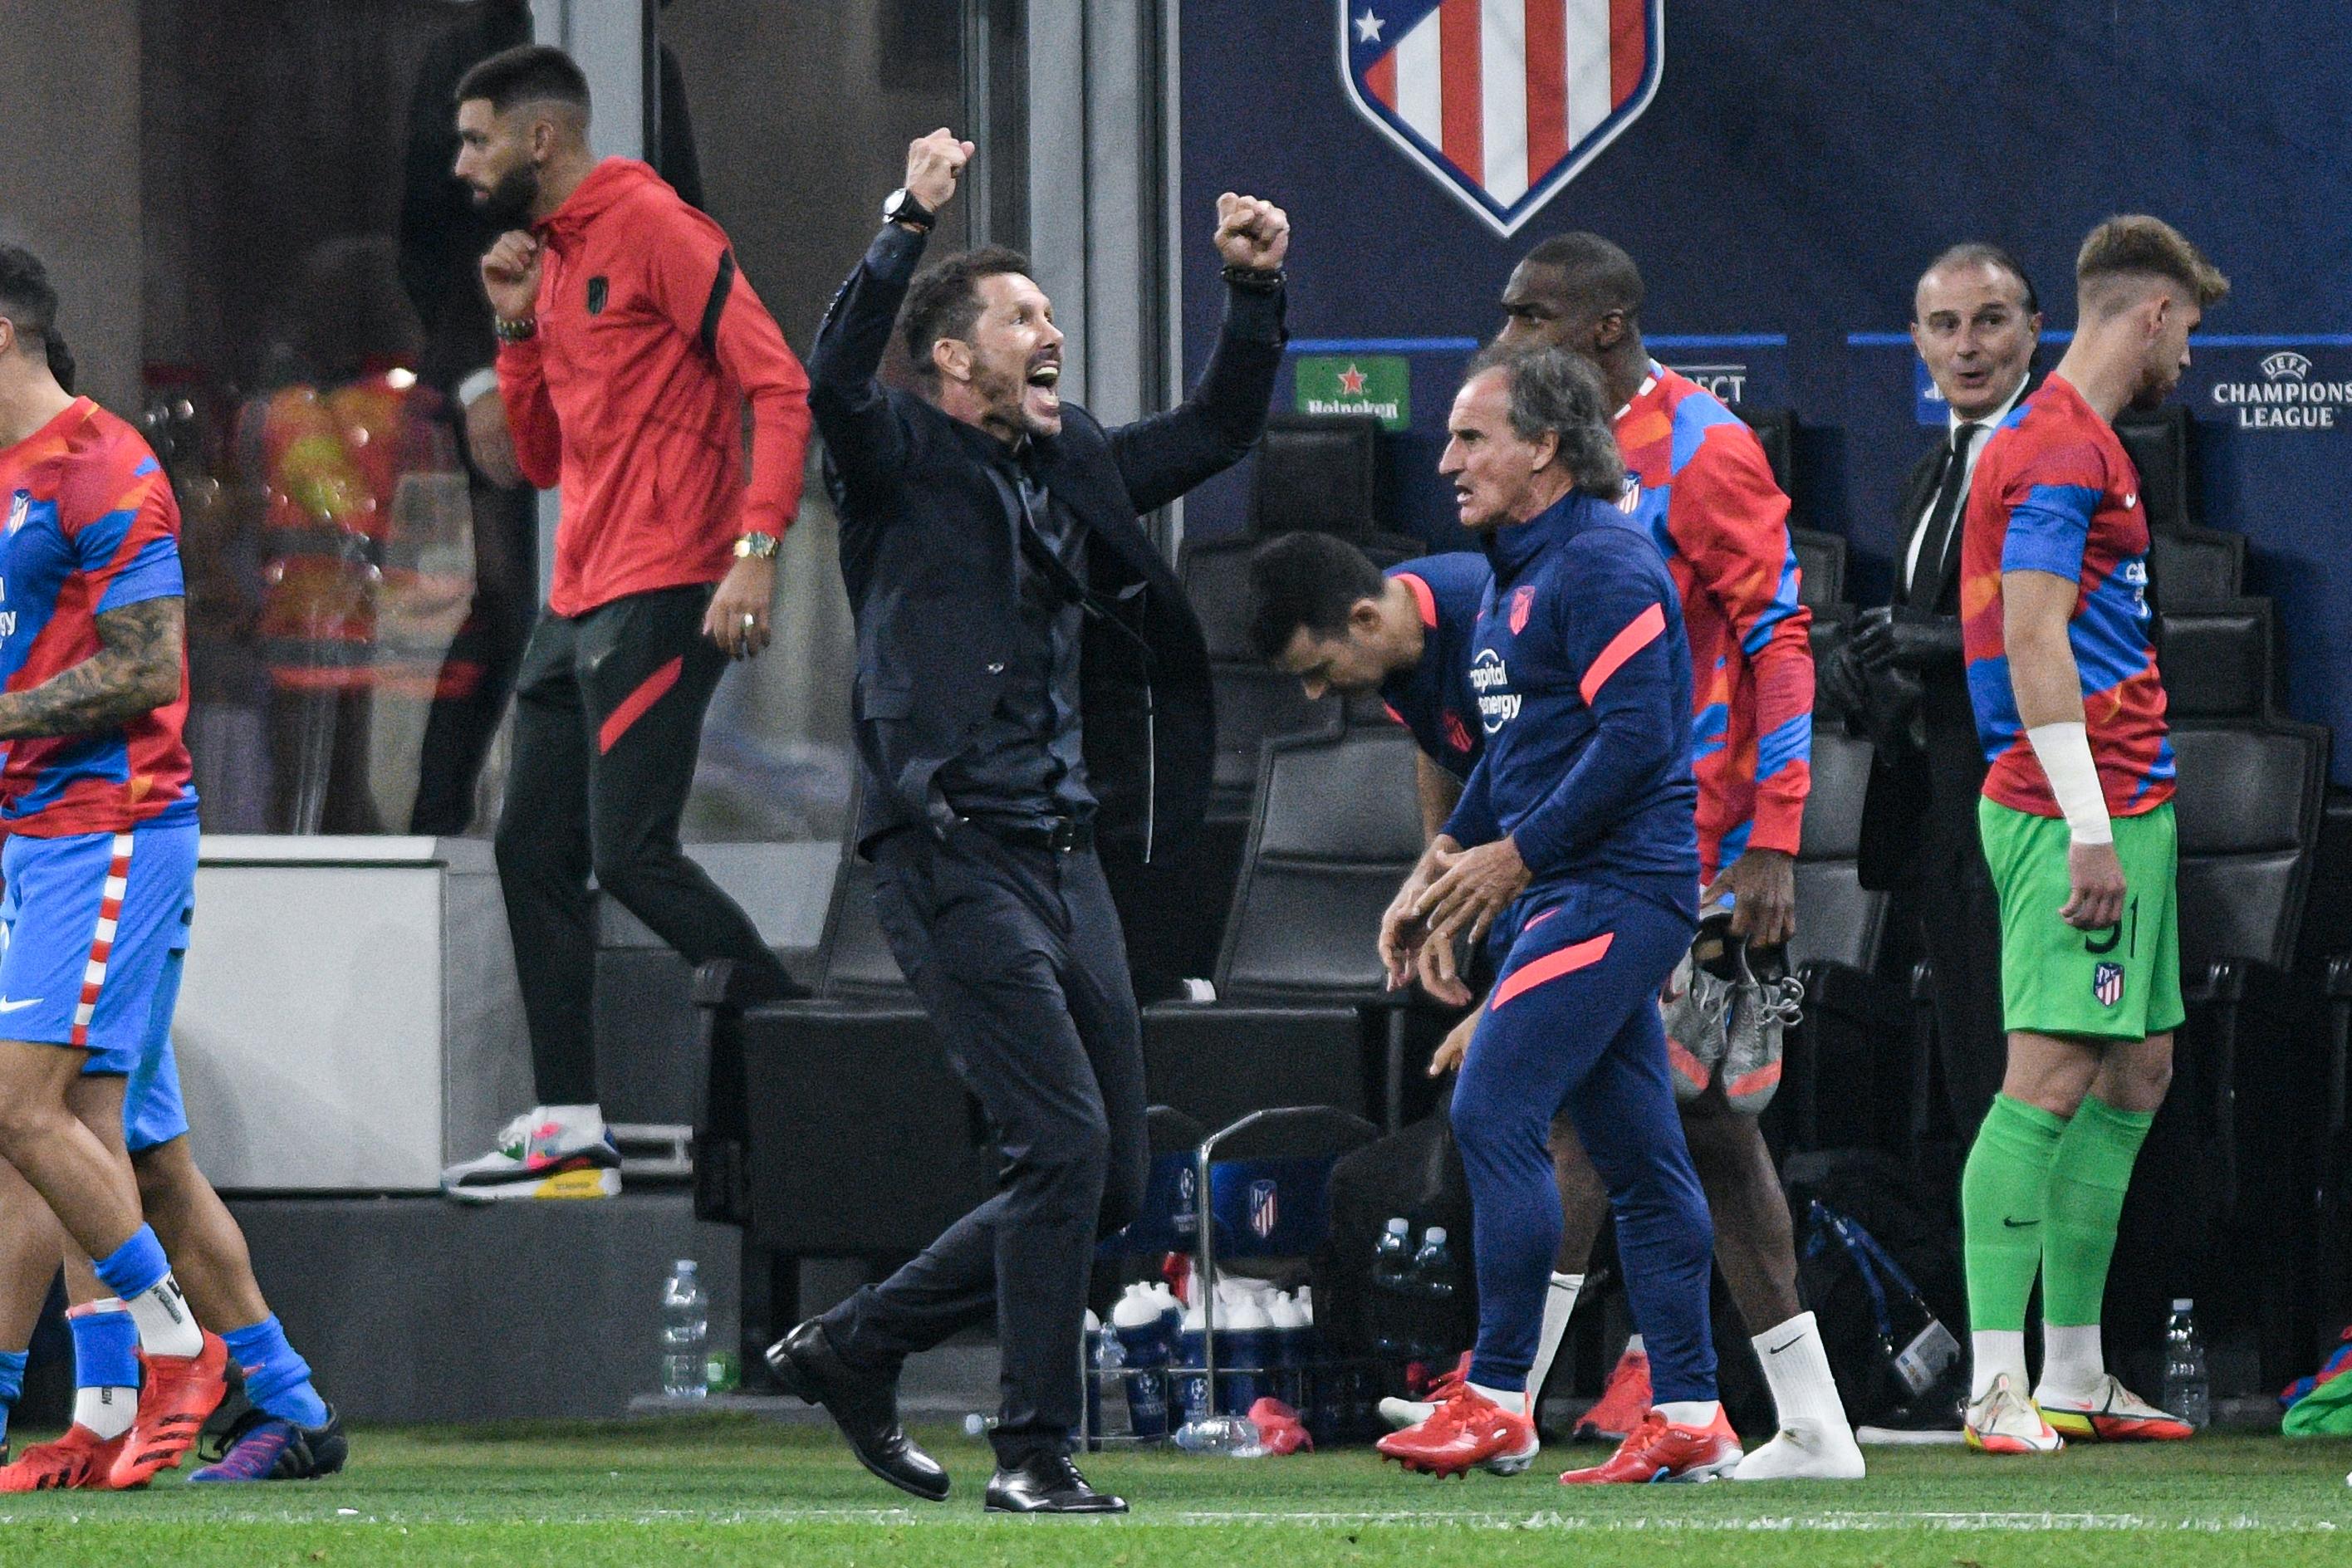 AC Milan v Atletico Madrid - UEFA Champions League